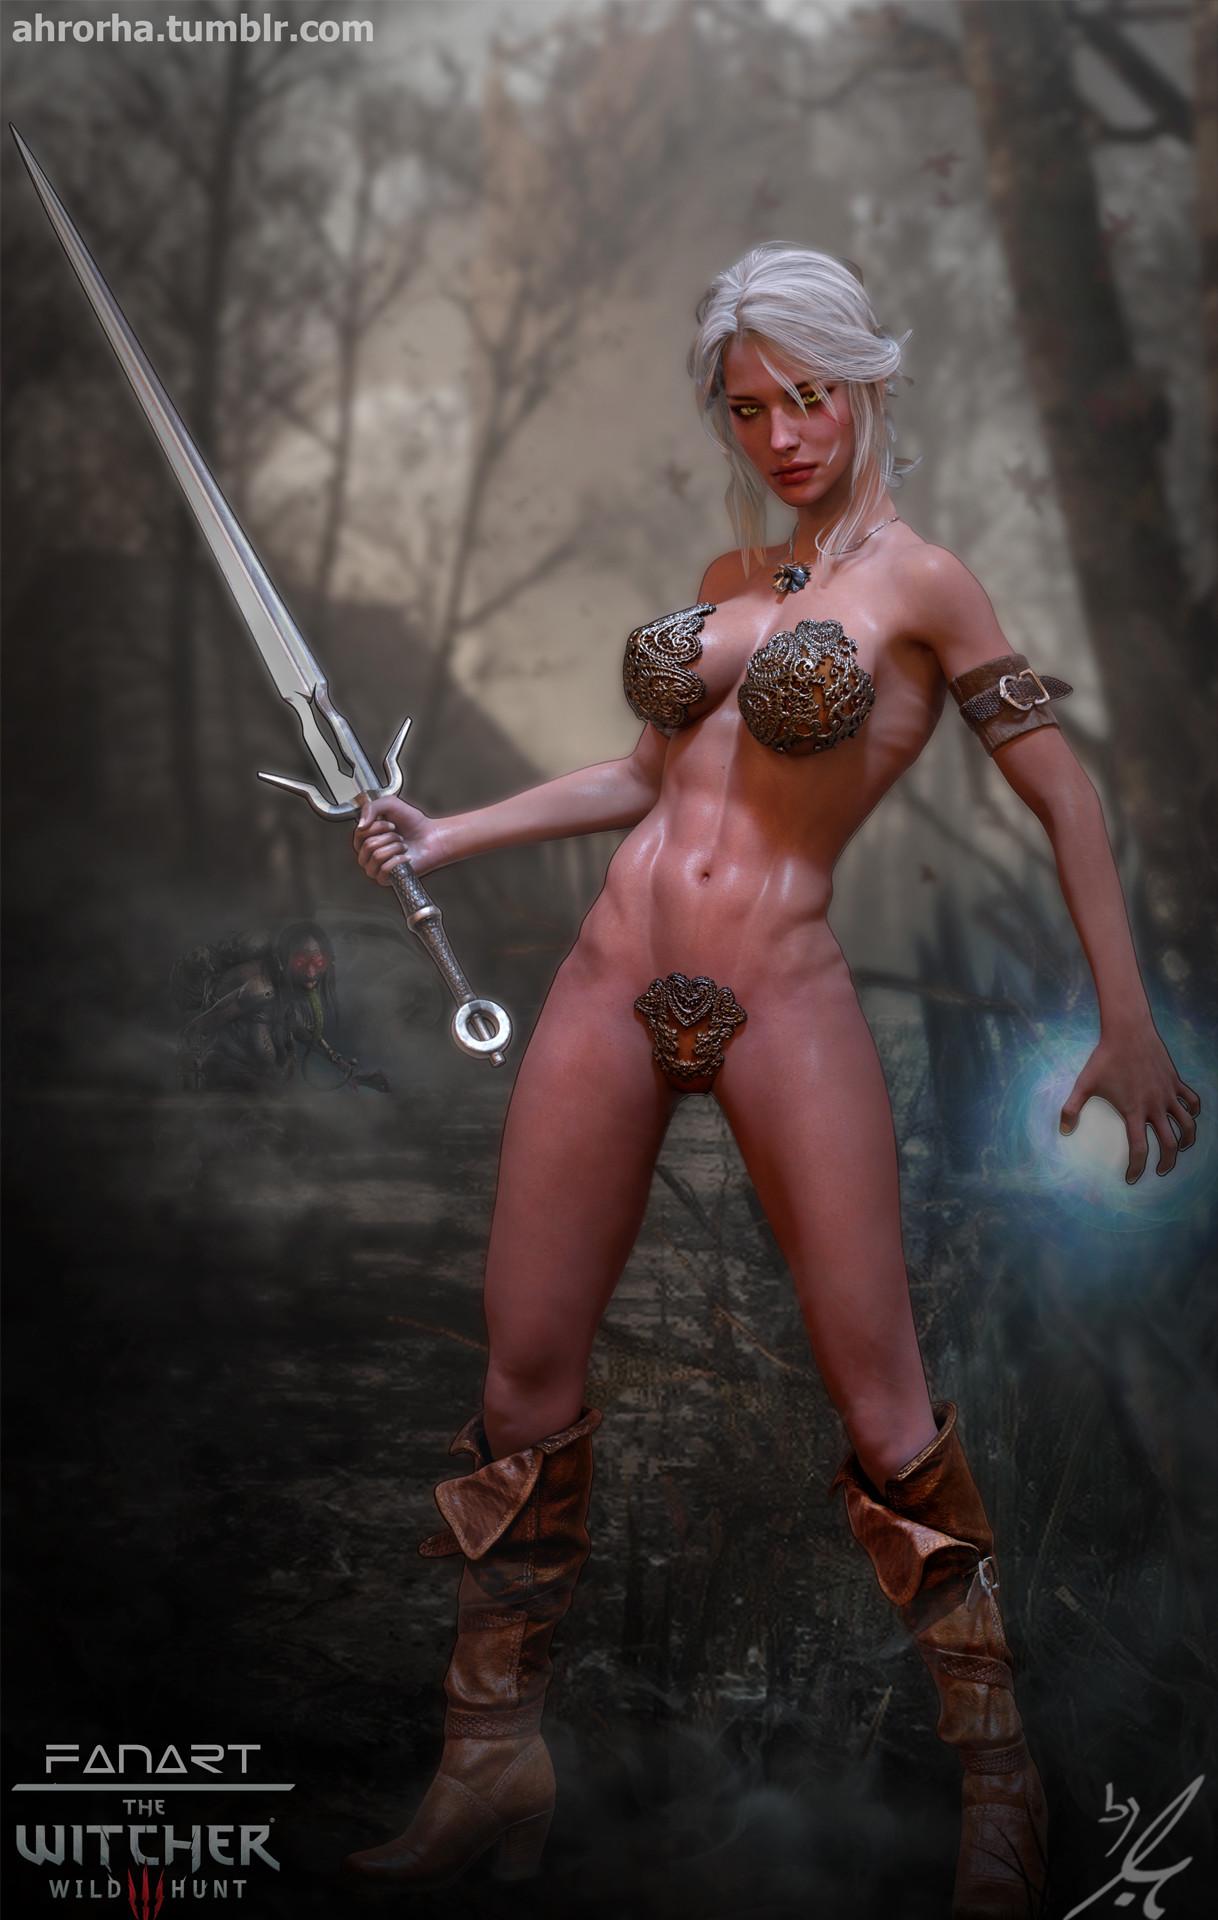 Fake nude photo funia porncraft film